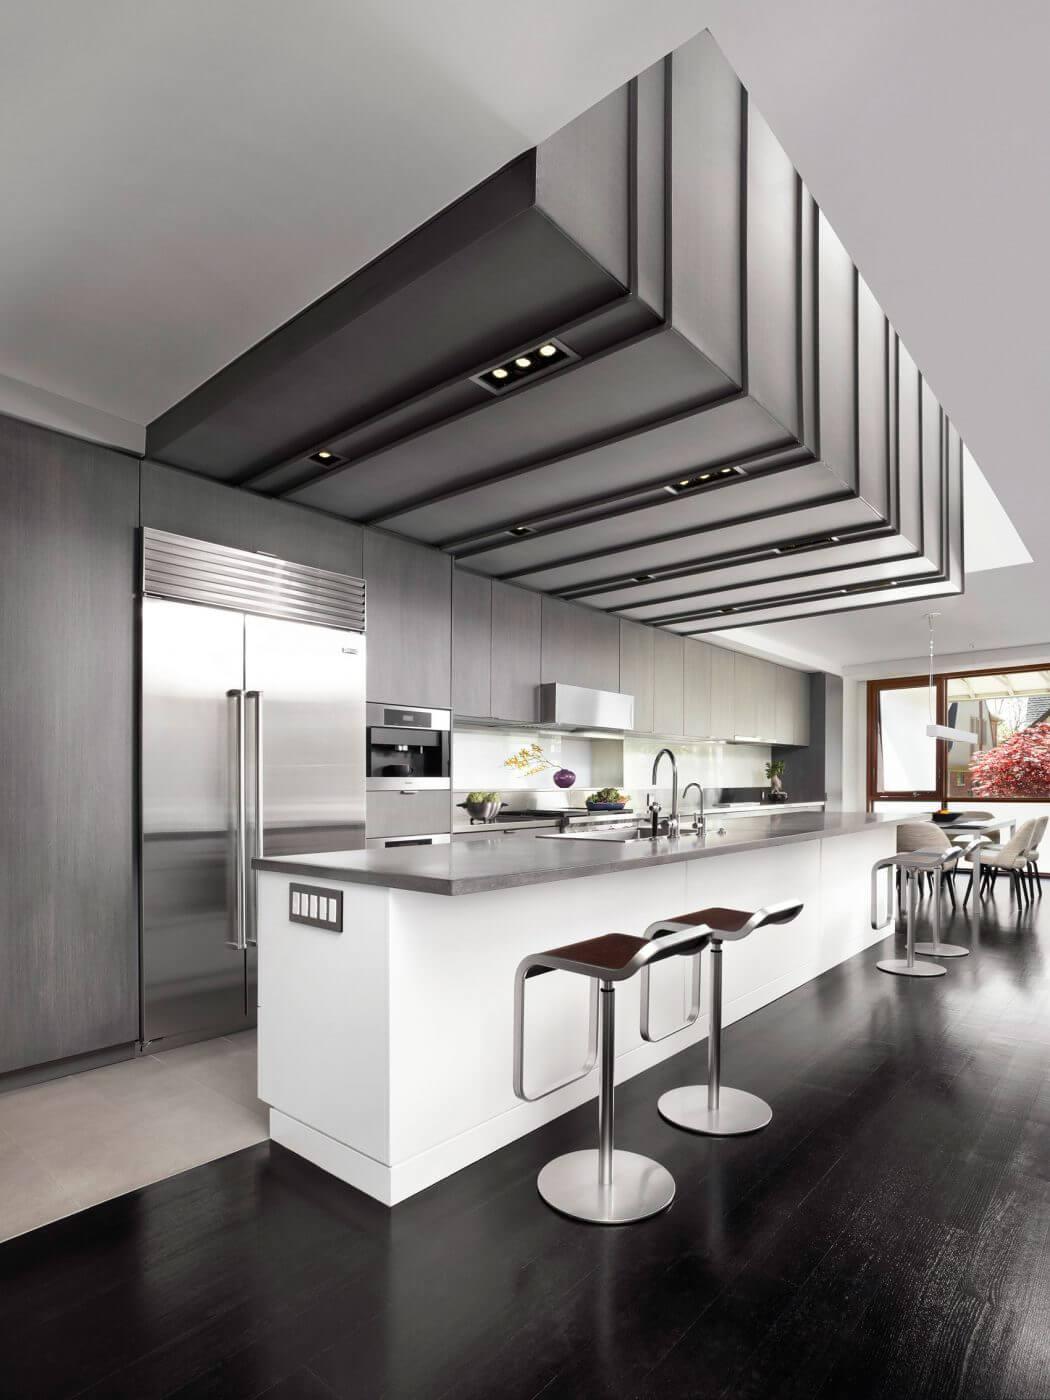 003-house-renovation-tongtong-1050x1400